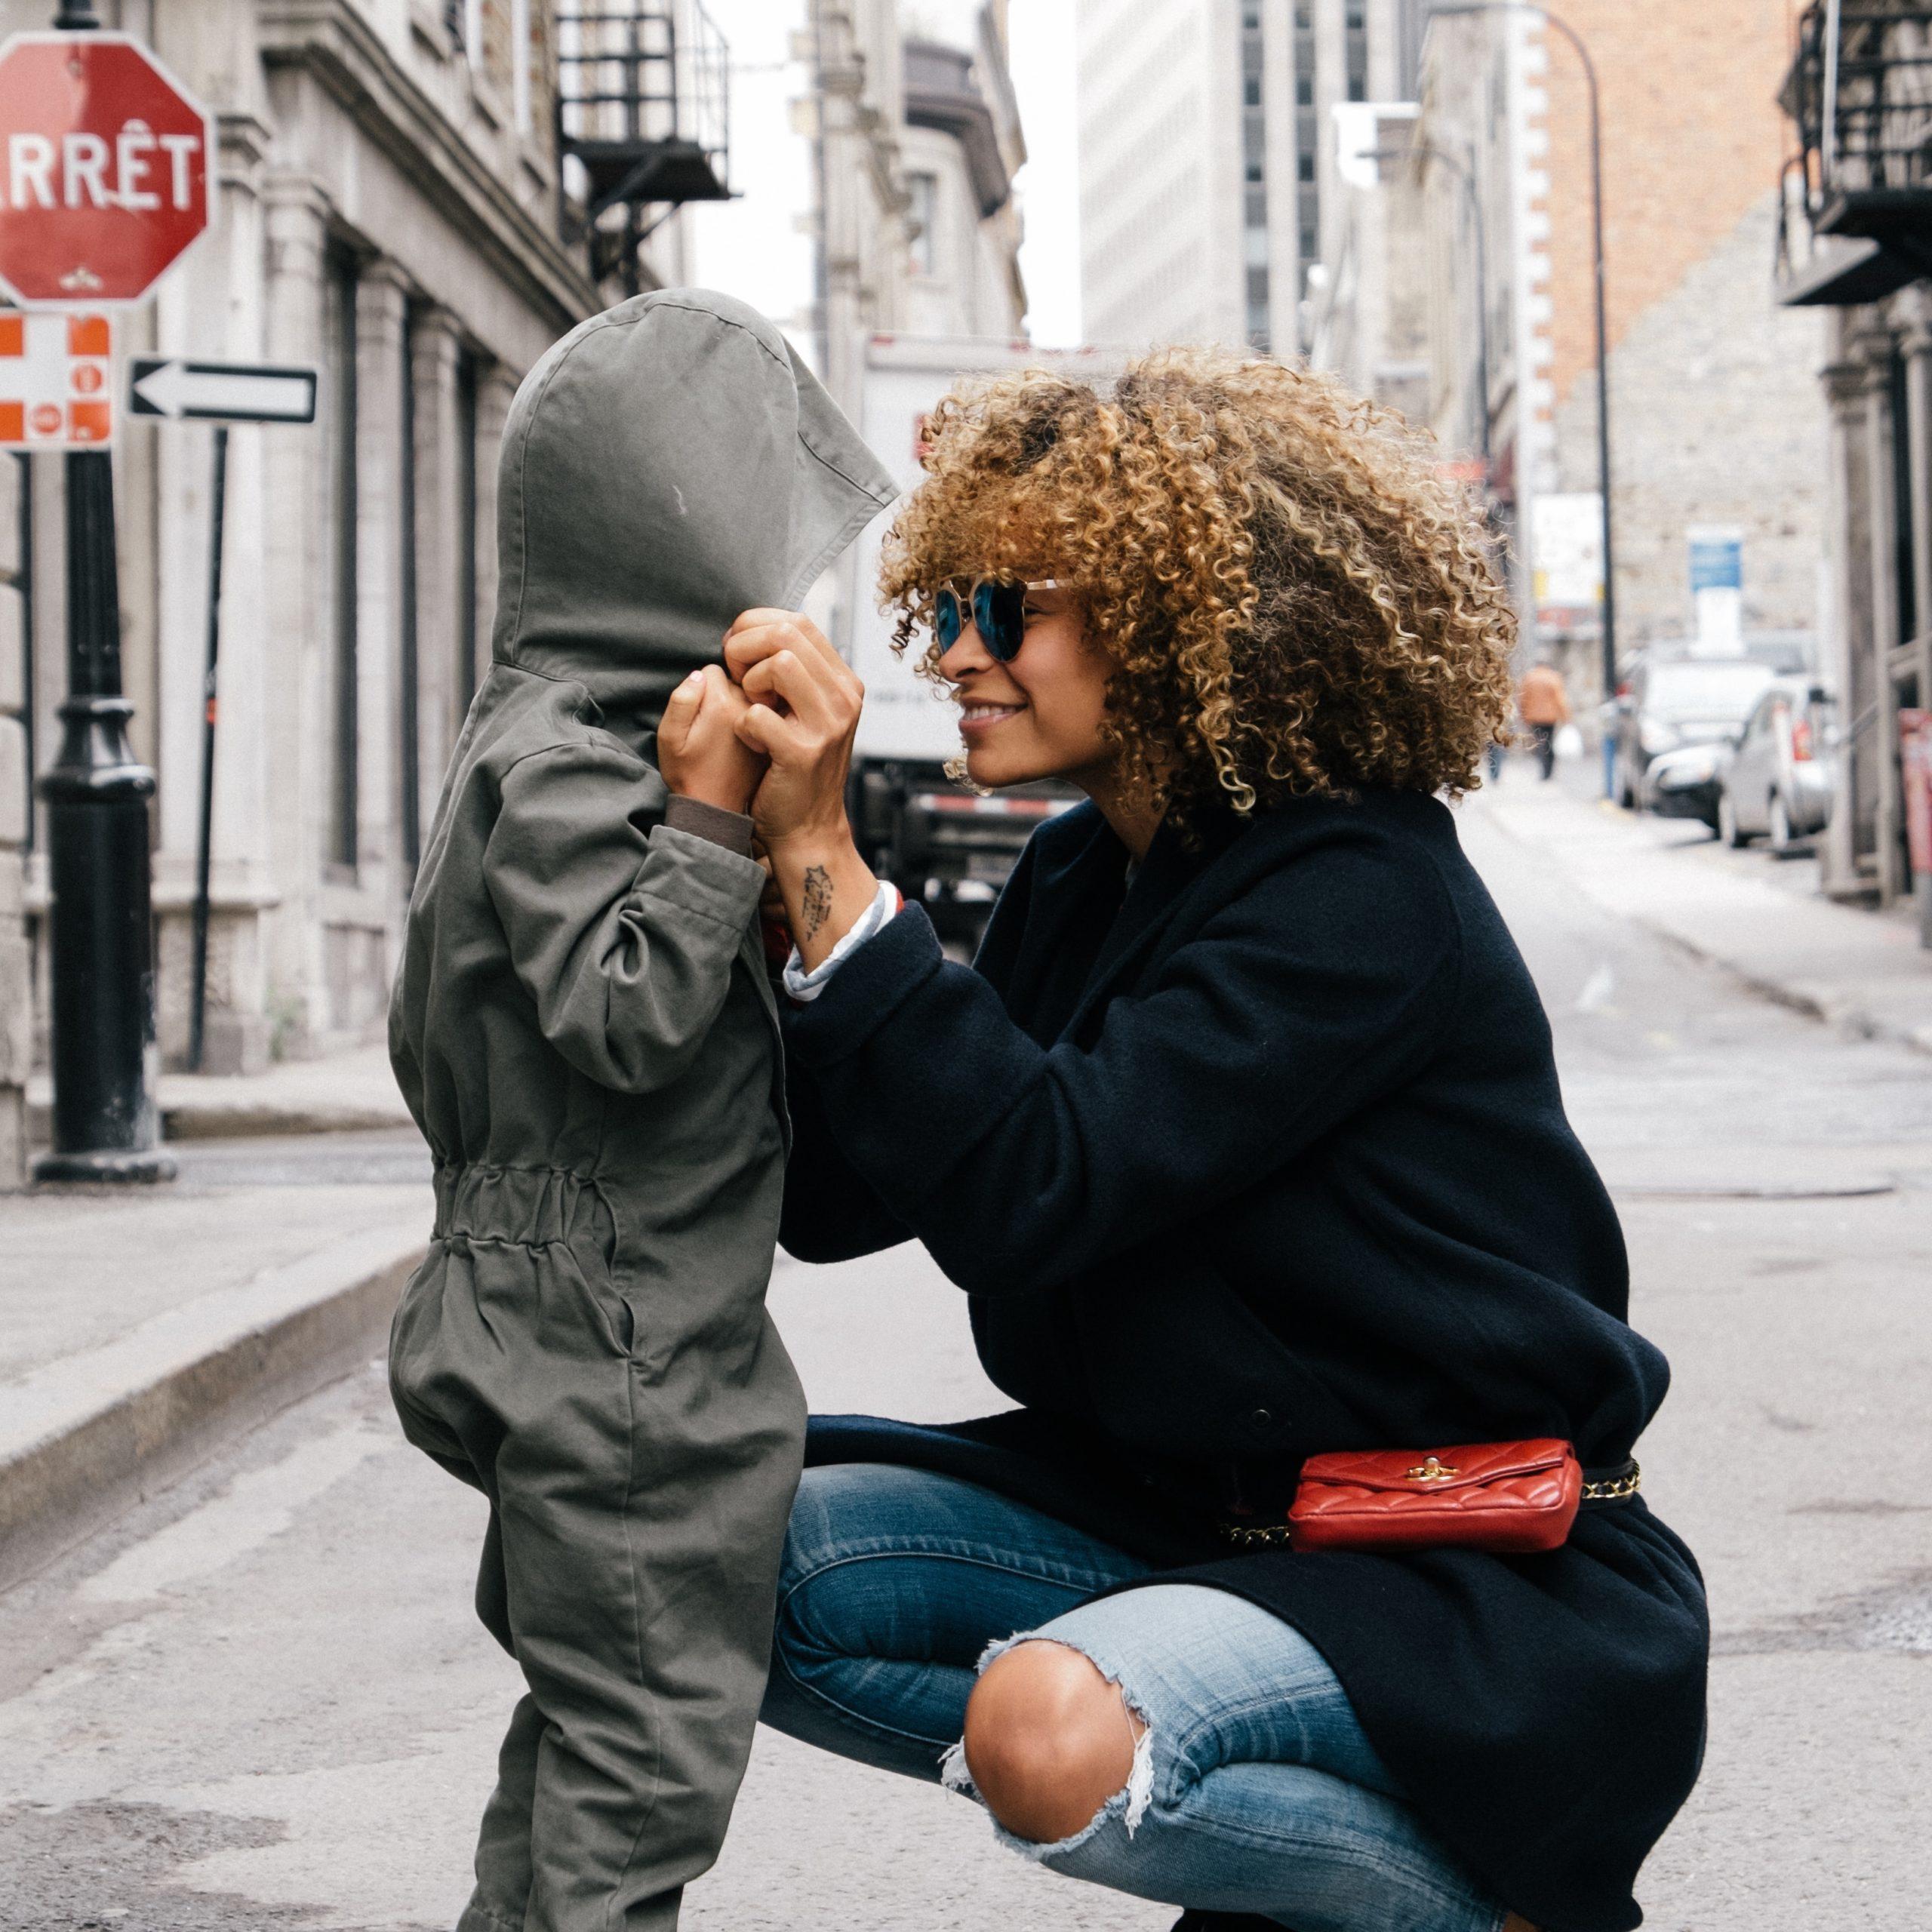 Child-Parent relationship